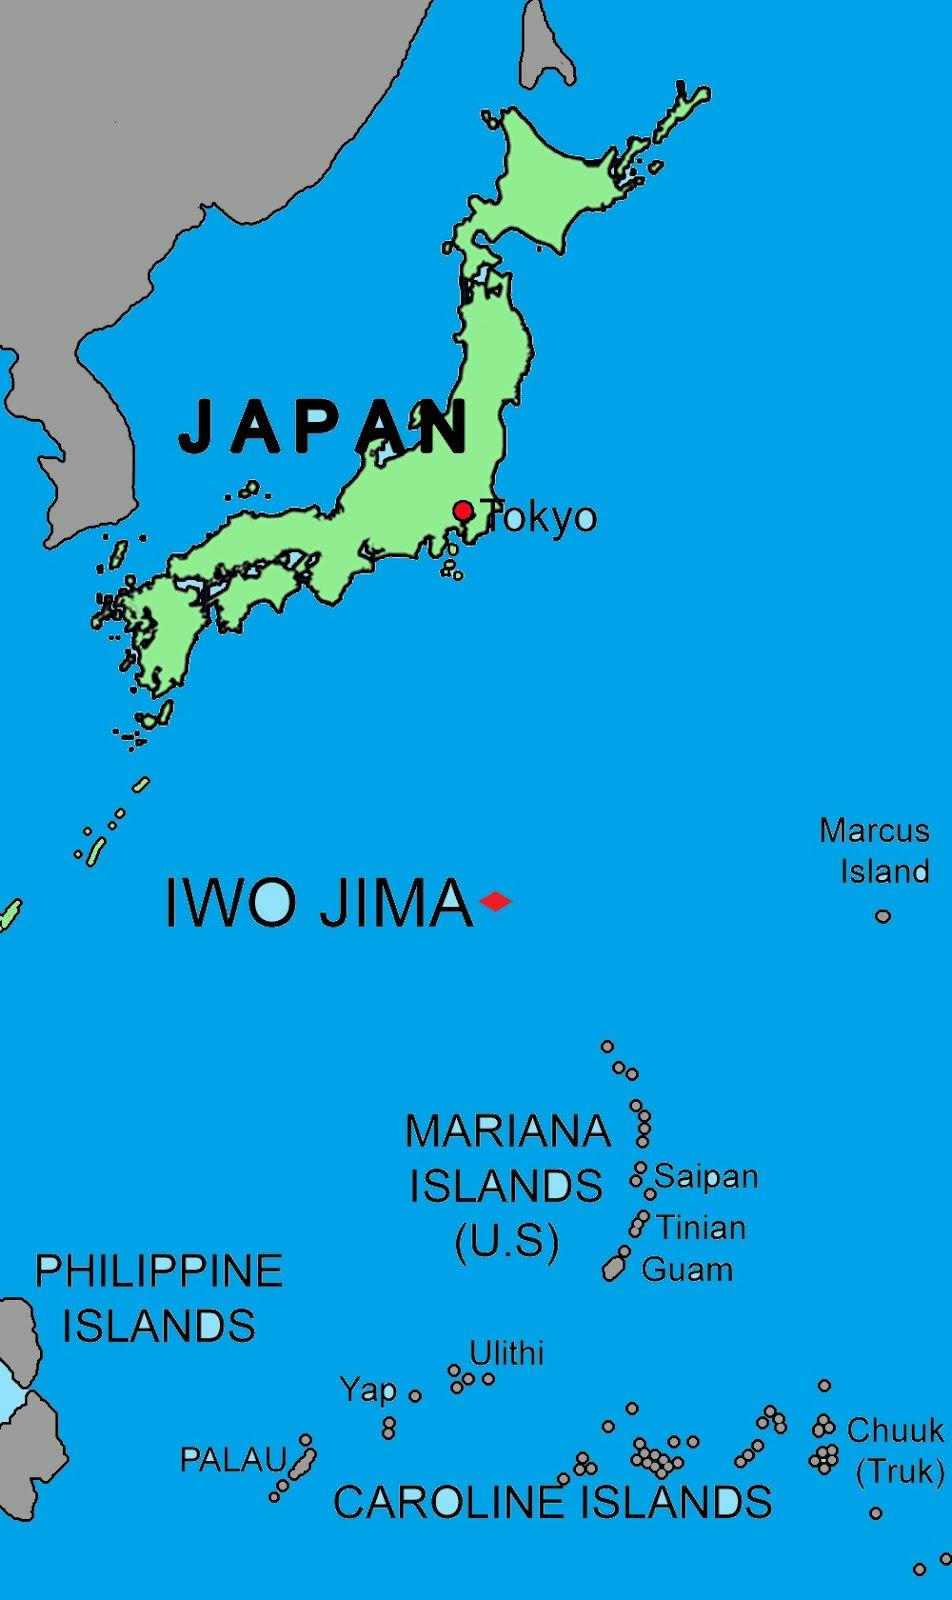 Where Is The Island Of Iwo Jima Located